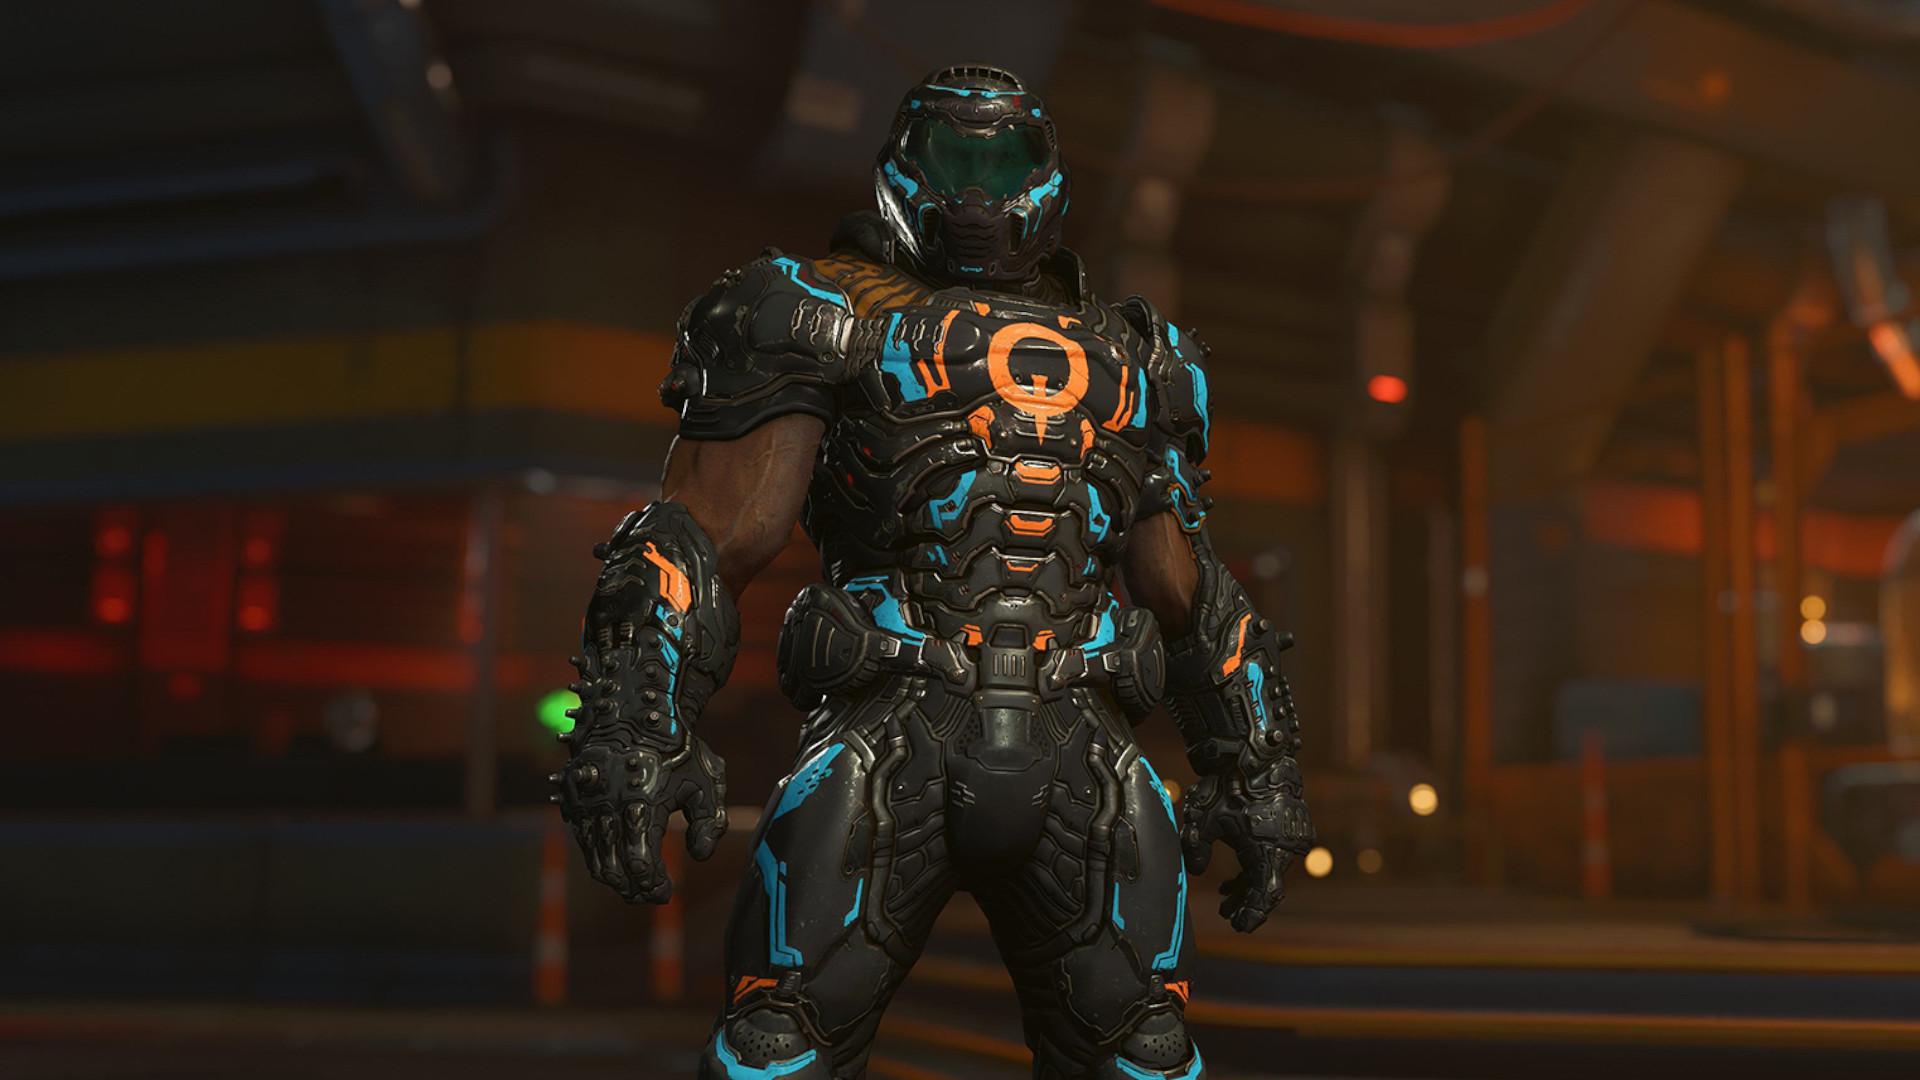 Doom Eternal 6.66 brings Horde mode, new Master Levels, and a Battle mode overhaul